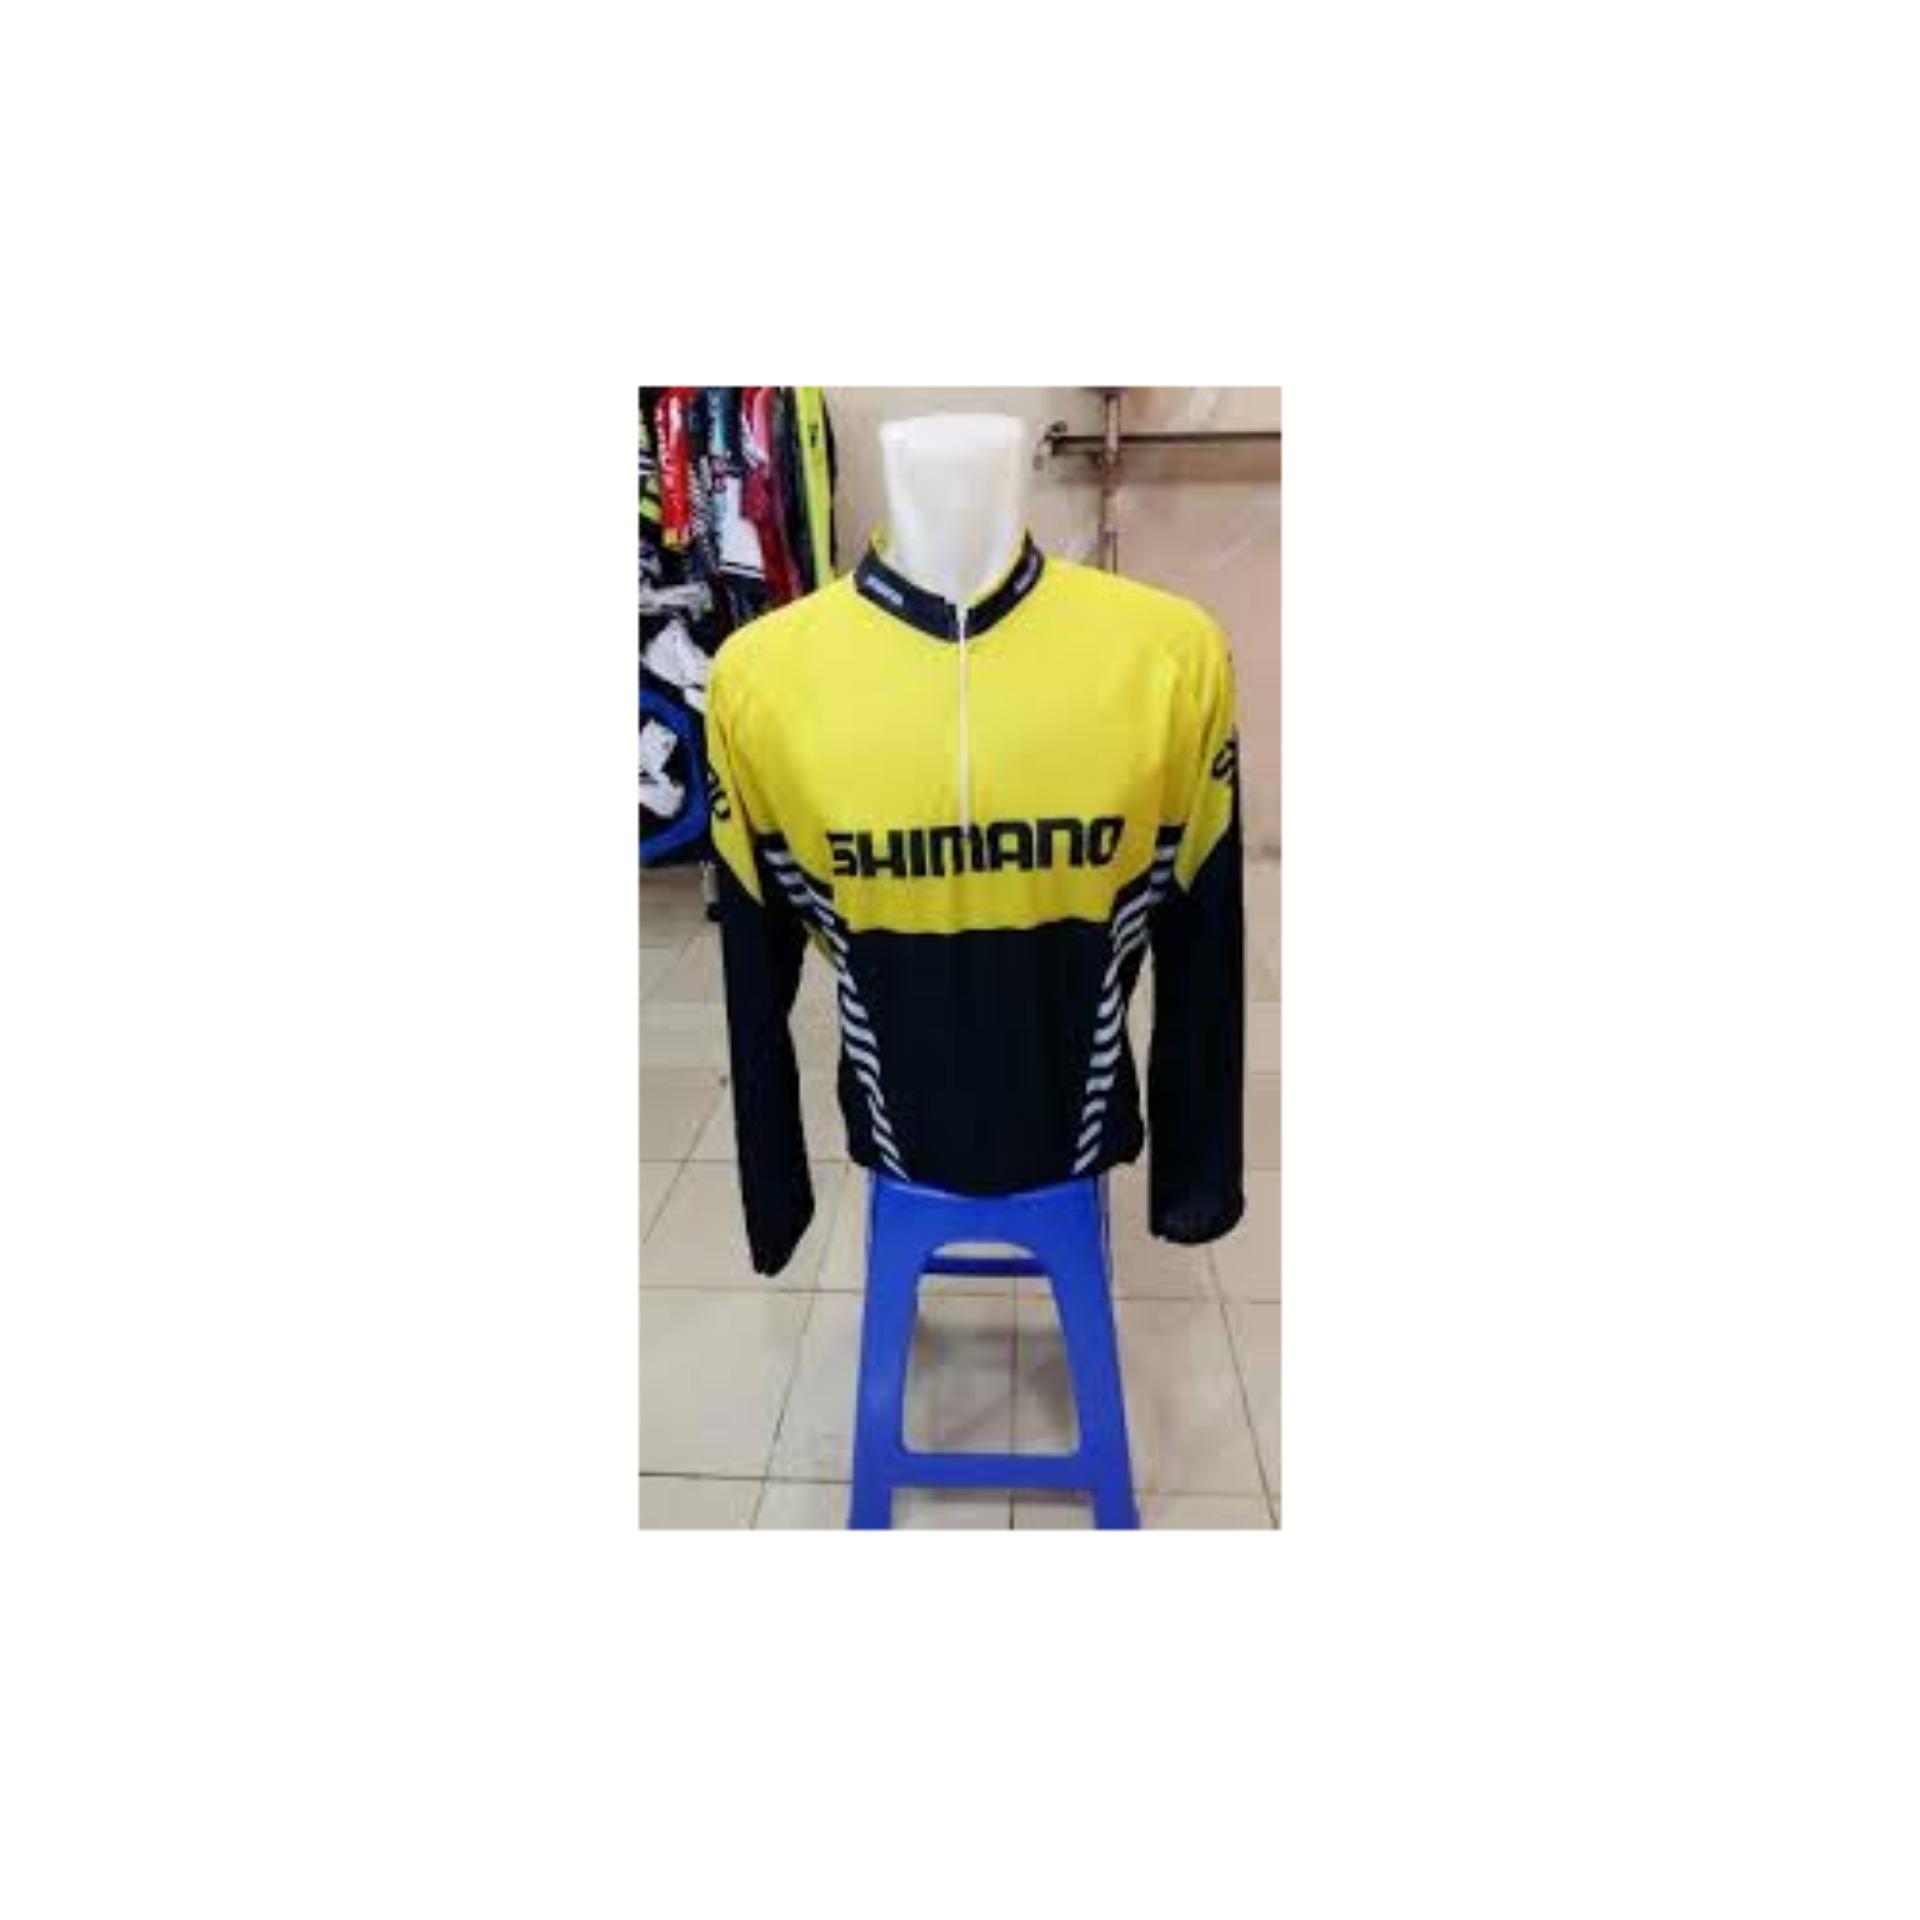 Kaos Baju JERSEY Sepeda Shimano Hitam Kuning Tangan Panjang 2017